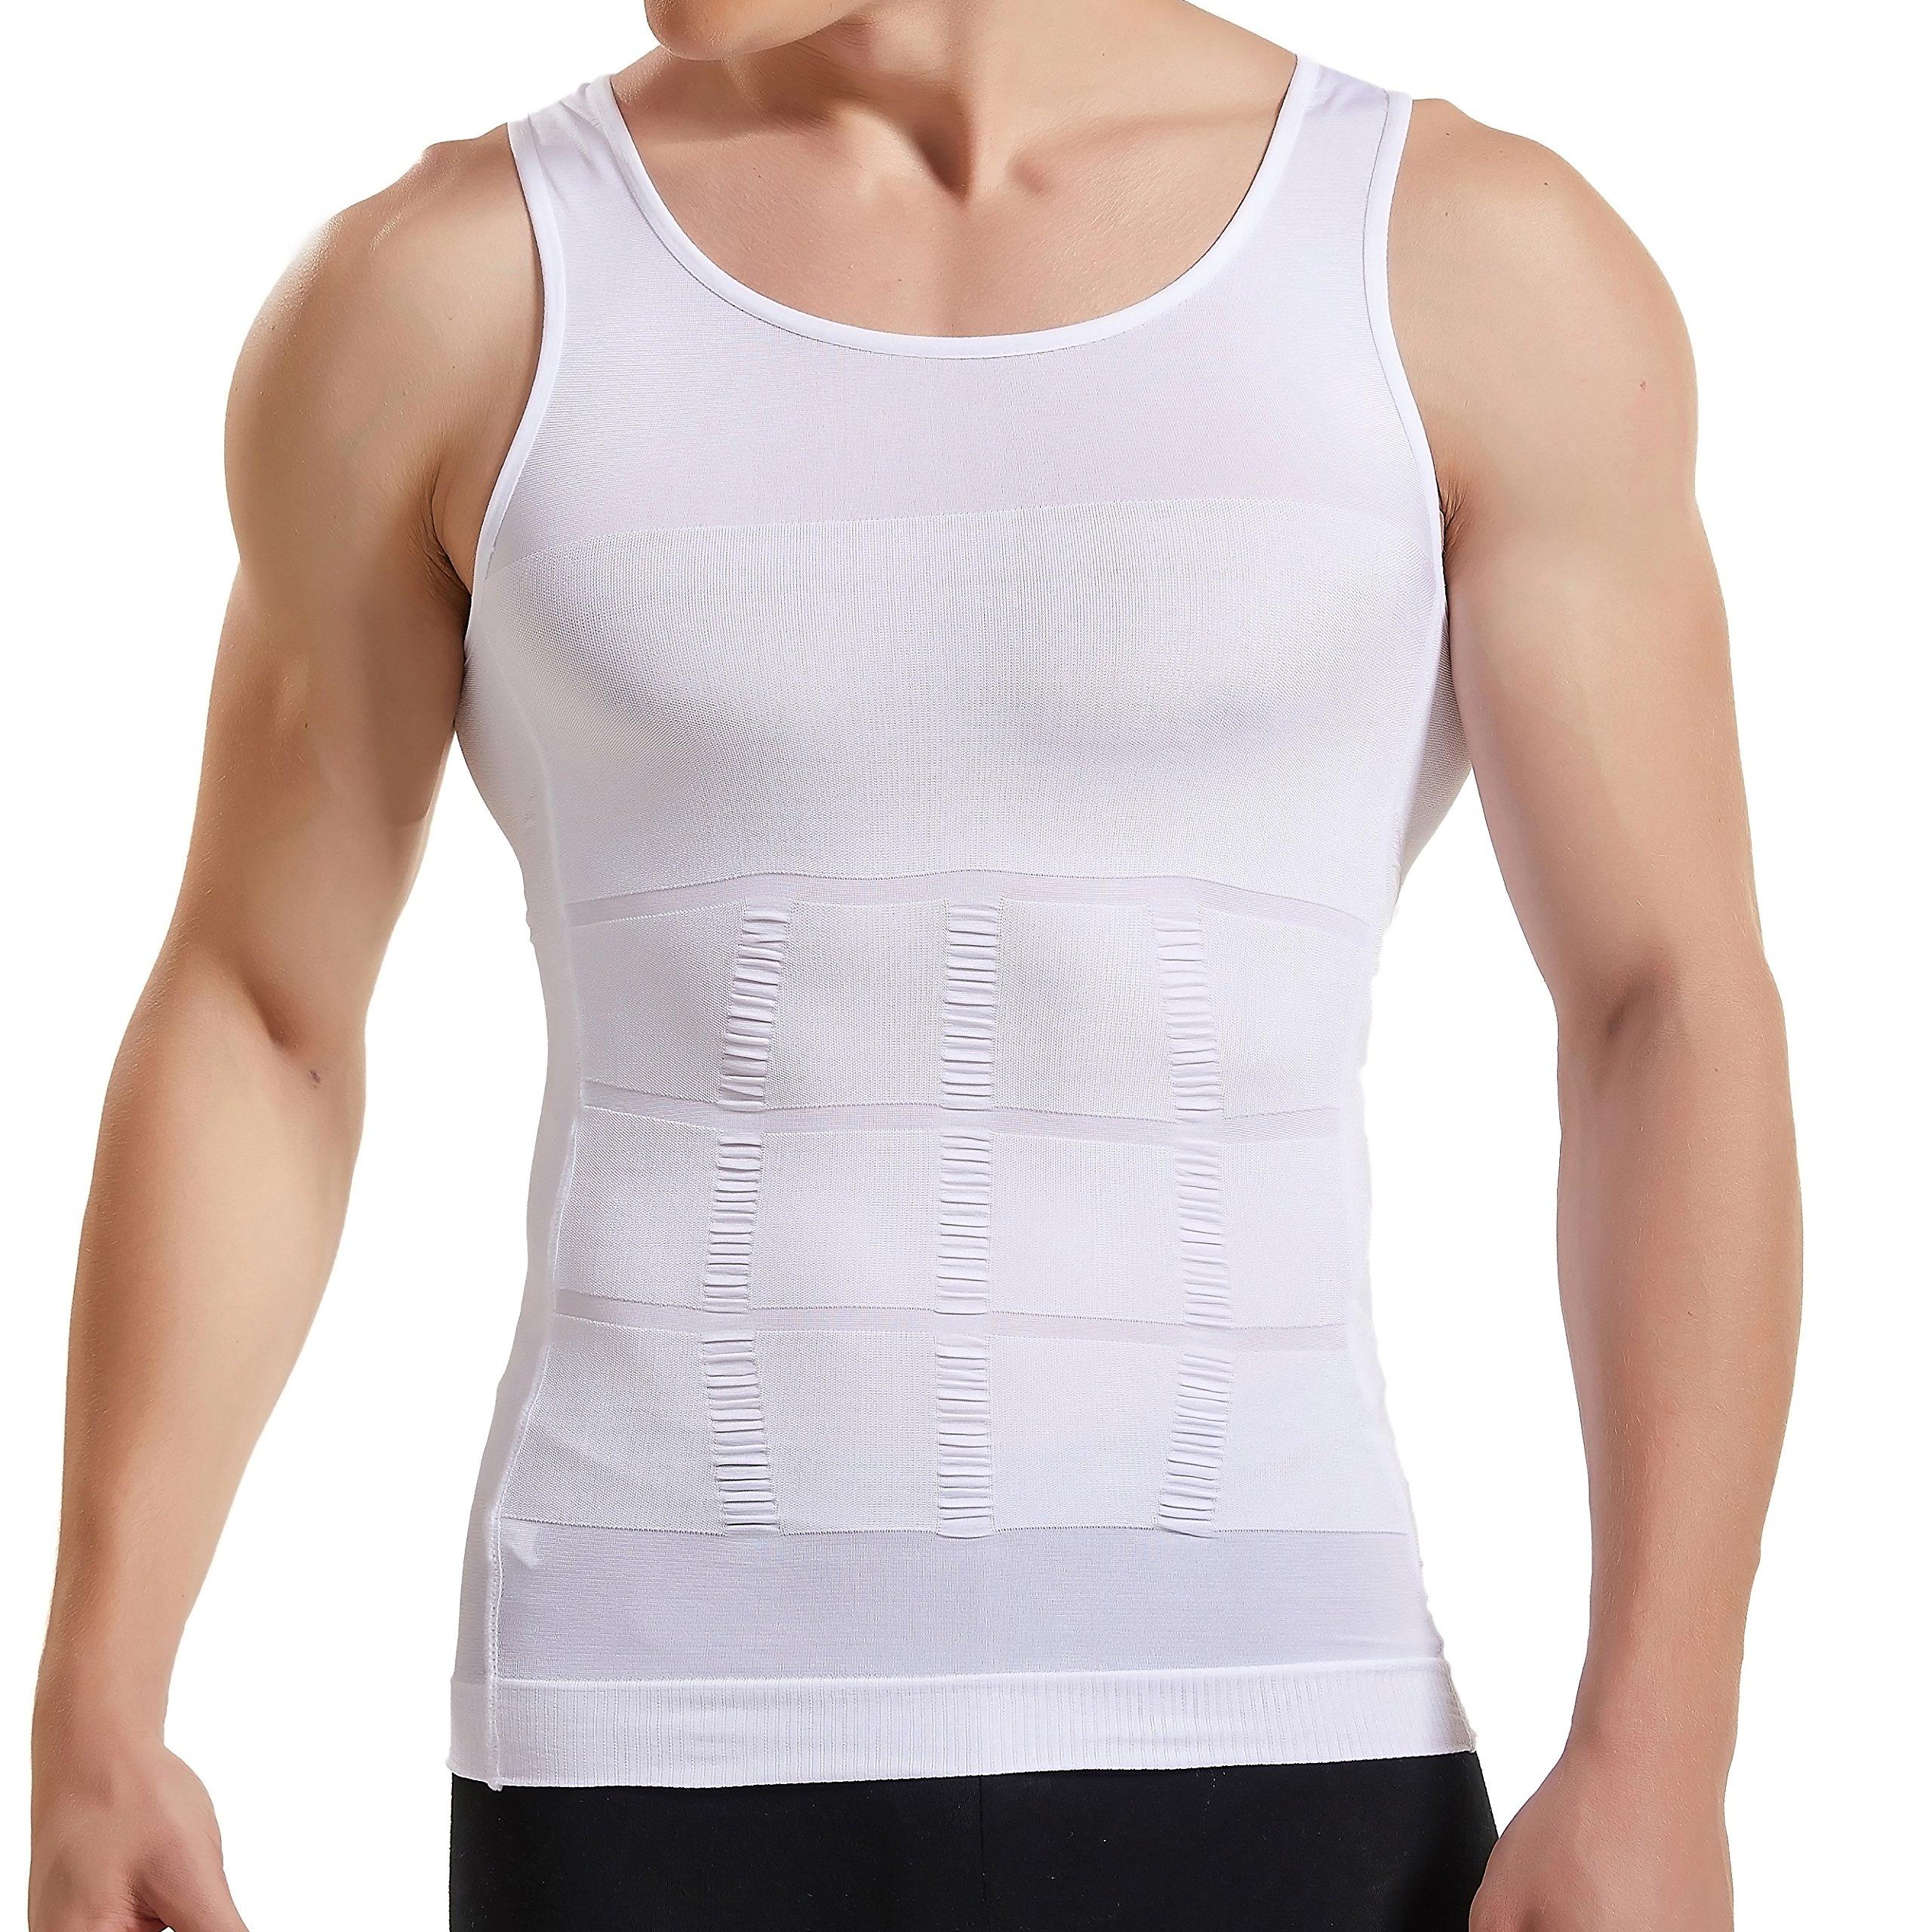 Hanerdun Mens Slimming Body Shaper Vests Undershirt Abs Abdomen Slim, White, Large by HANERDUN